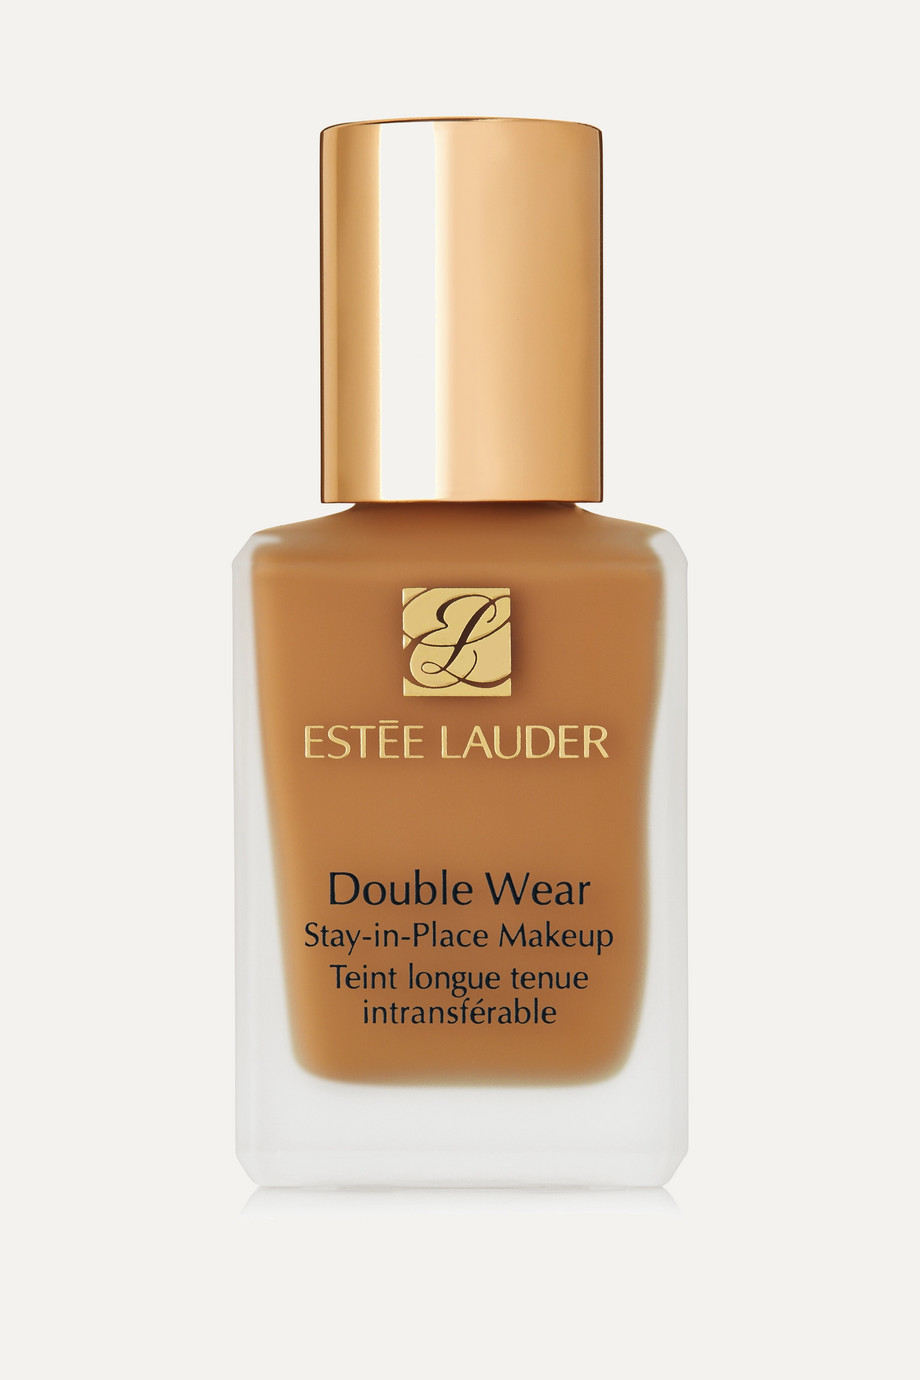 Estée Lauder Double Wear Stay-in-Place Makeup - Fawn 3W1.5